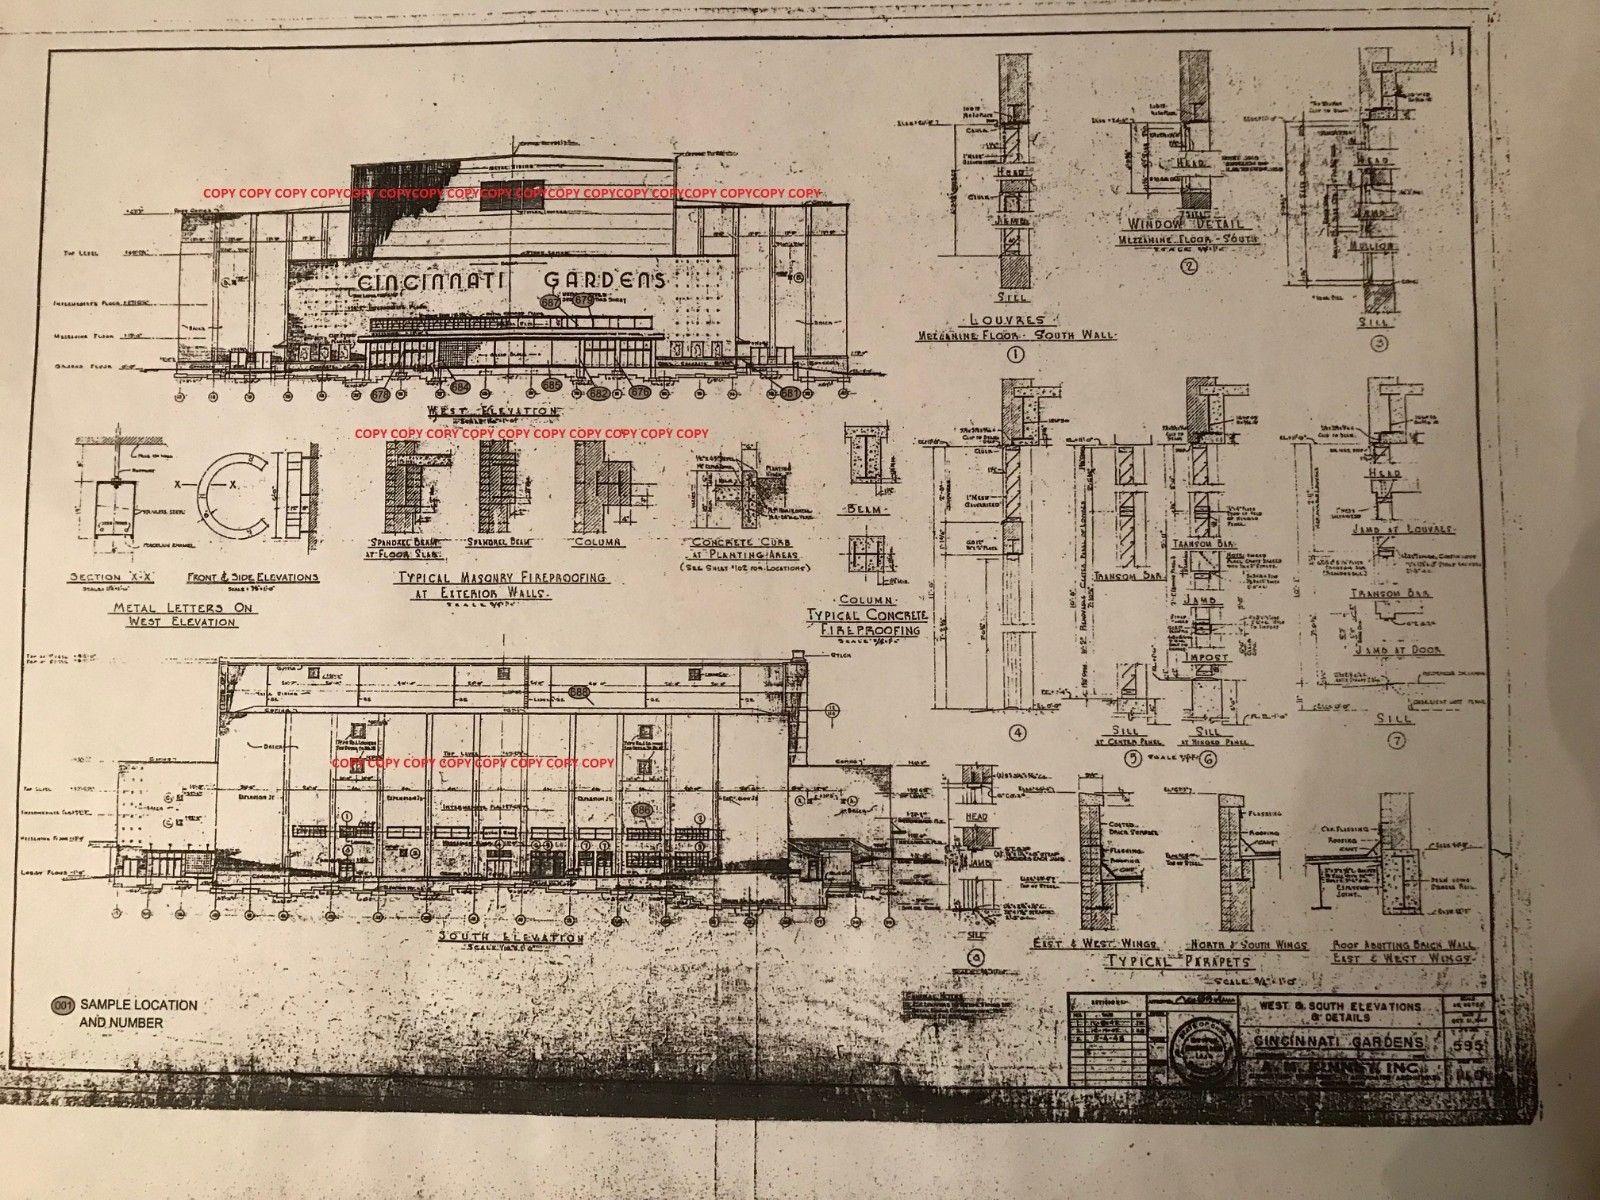 Cincinnati gardens blueprint historic cincinnati pinterest cincinnati gardens blueprint malvernweather Images